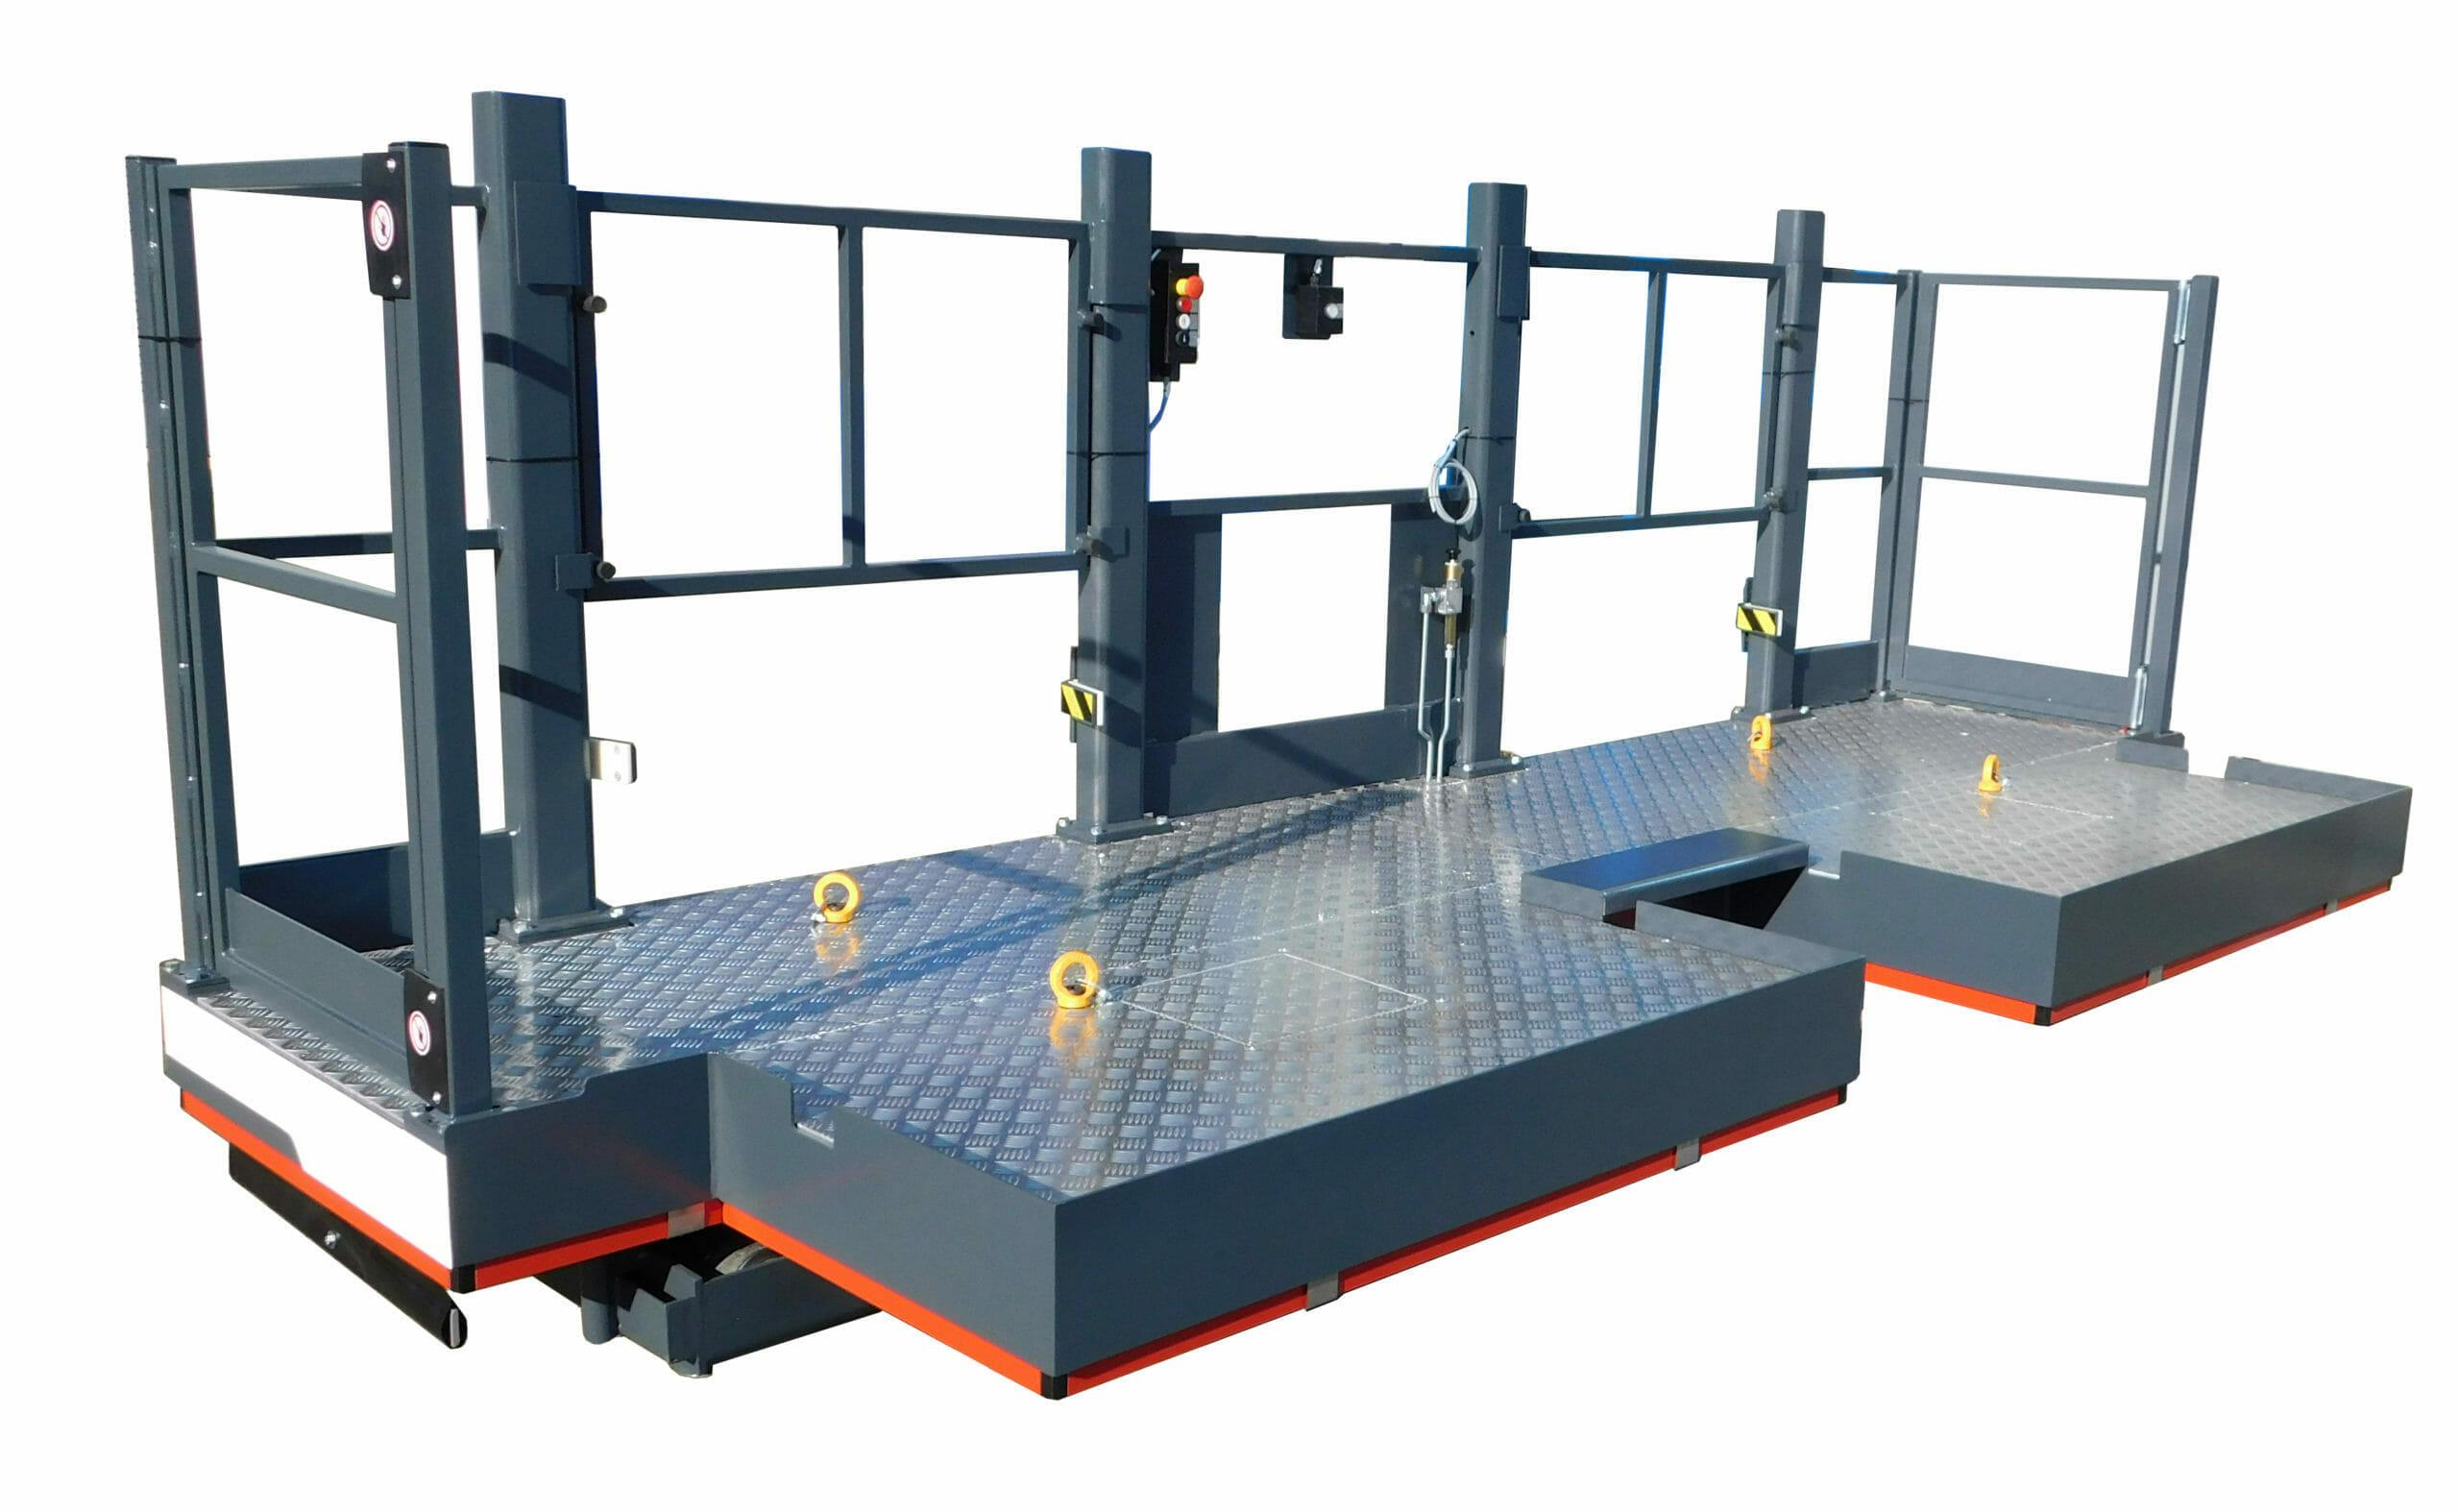 Figure Stationary work platform